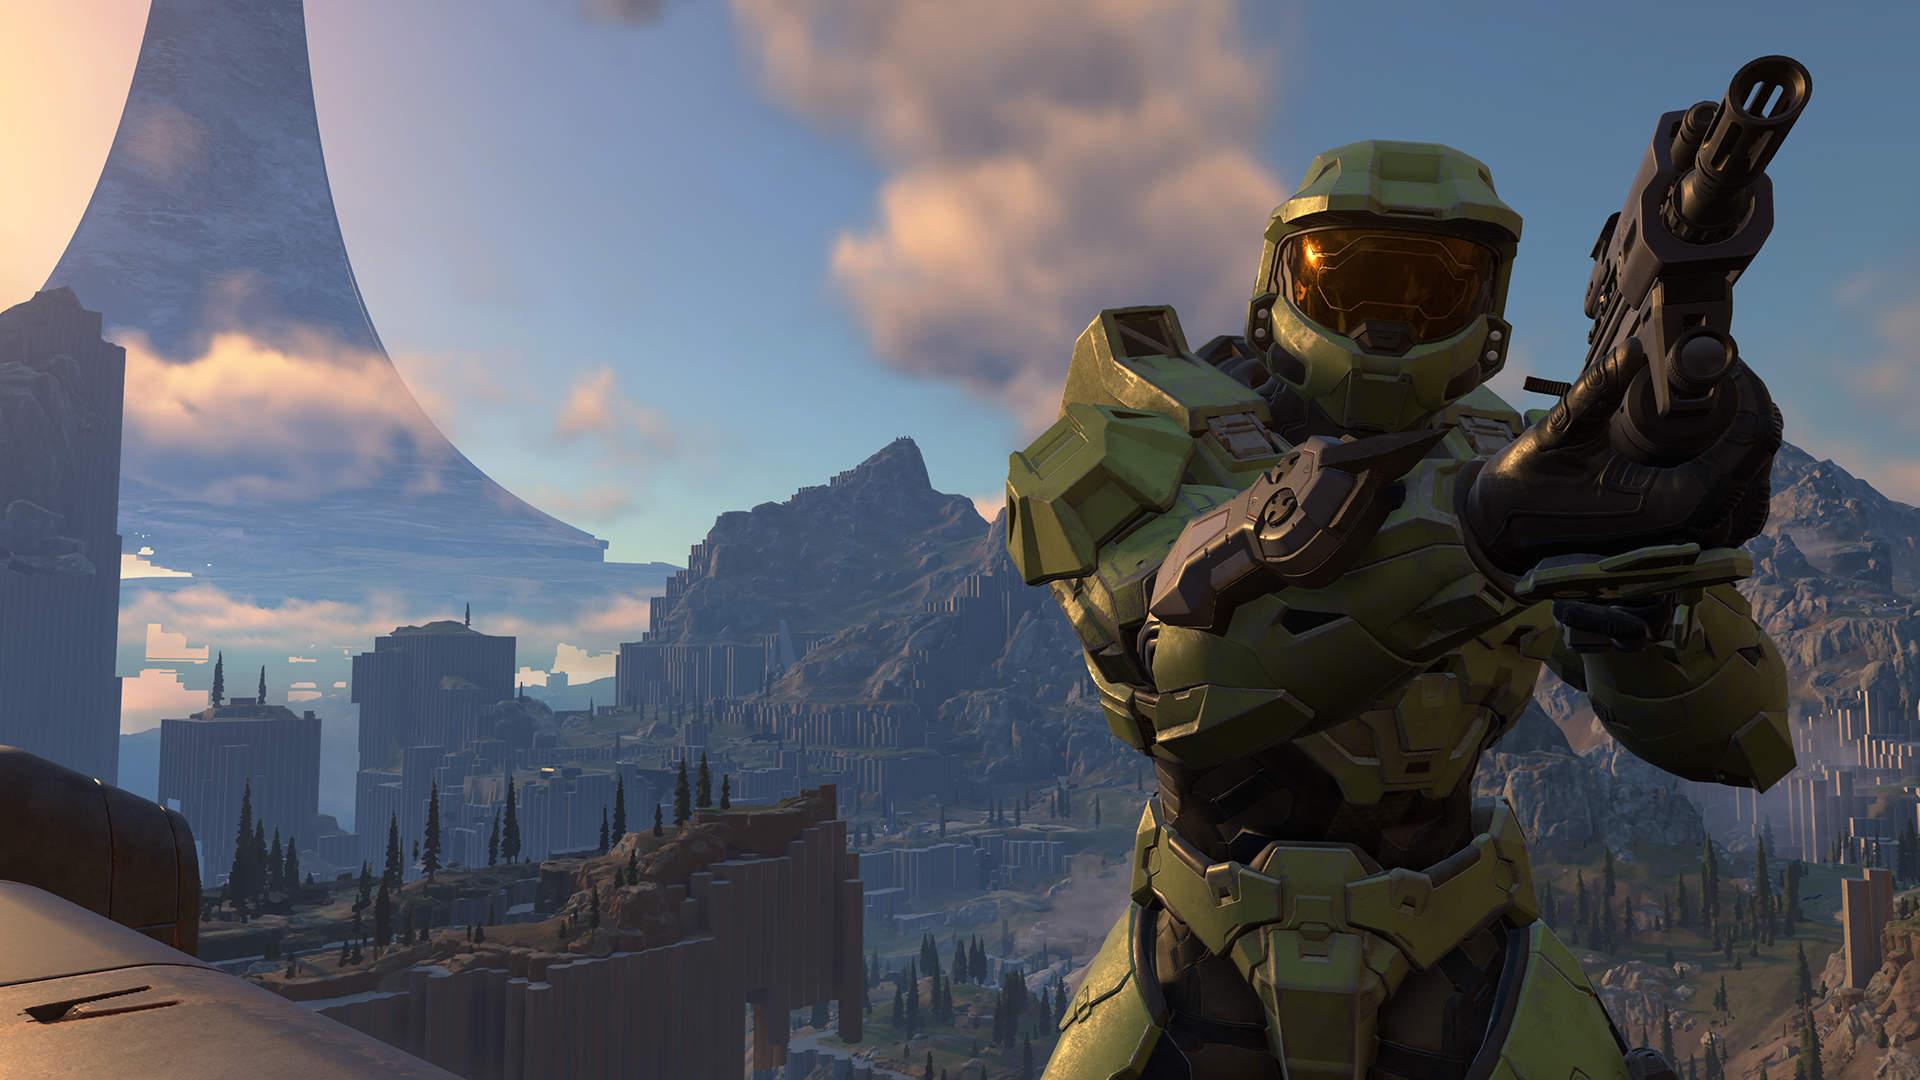 Halo Infinite Has Been Delayed Into 2021